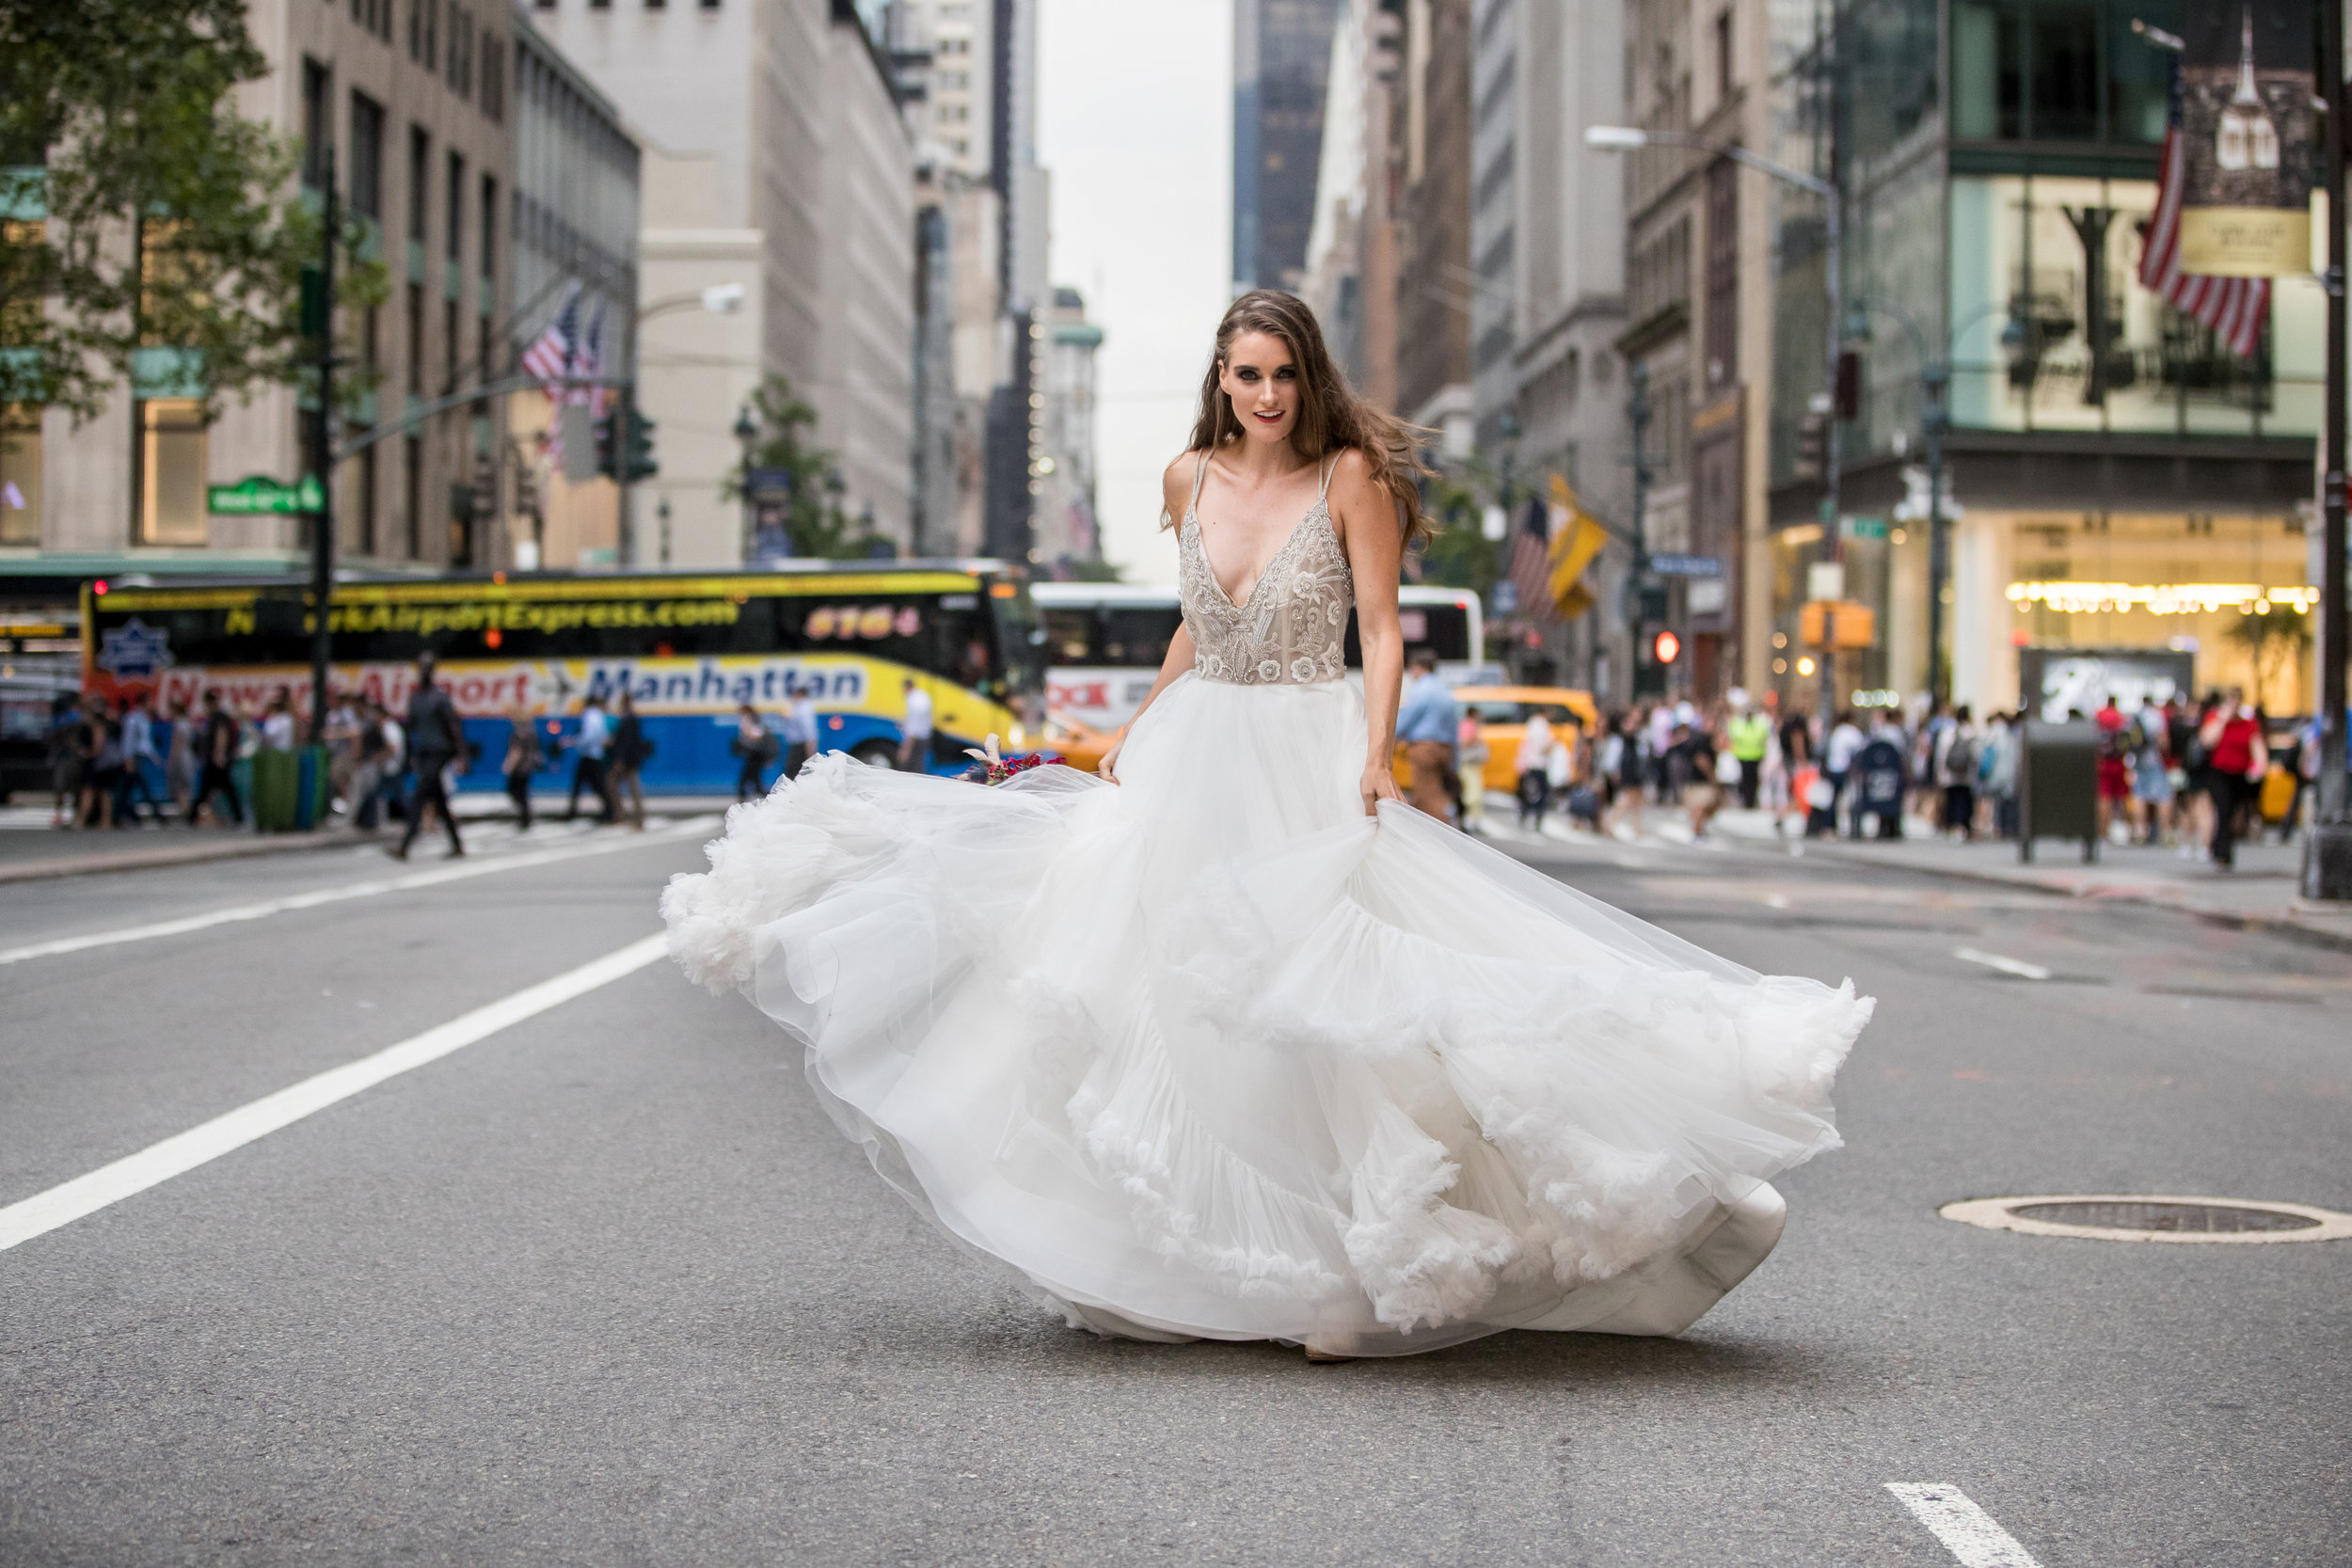 new york city wedding dress bride photography 0024